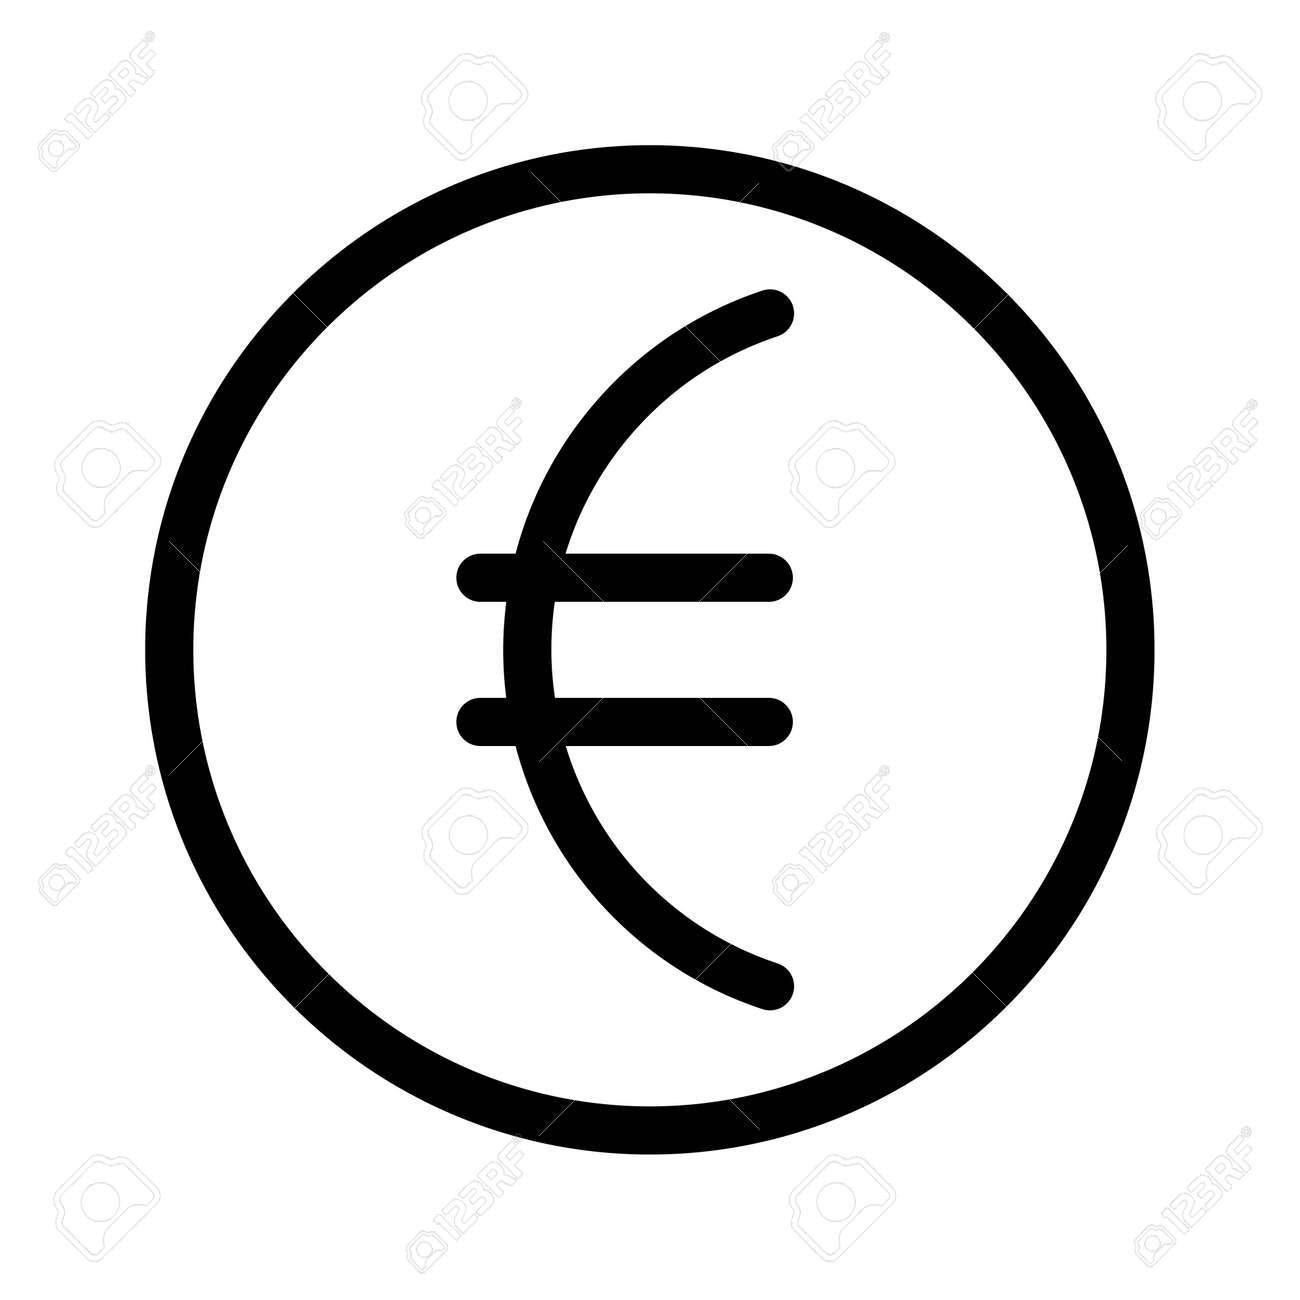 Euro vector icon in flat design. Vector illustration of the euro symbol. - 159158529